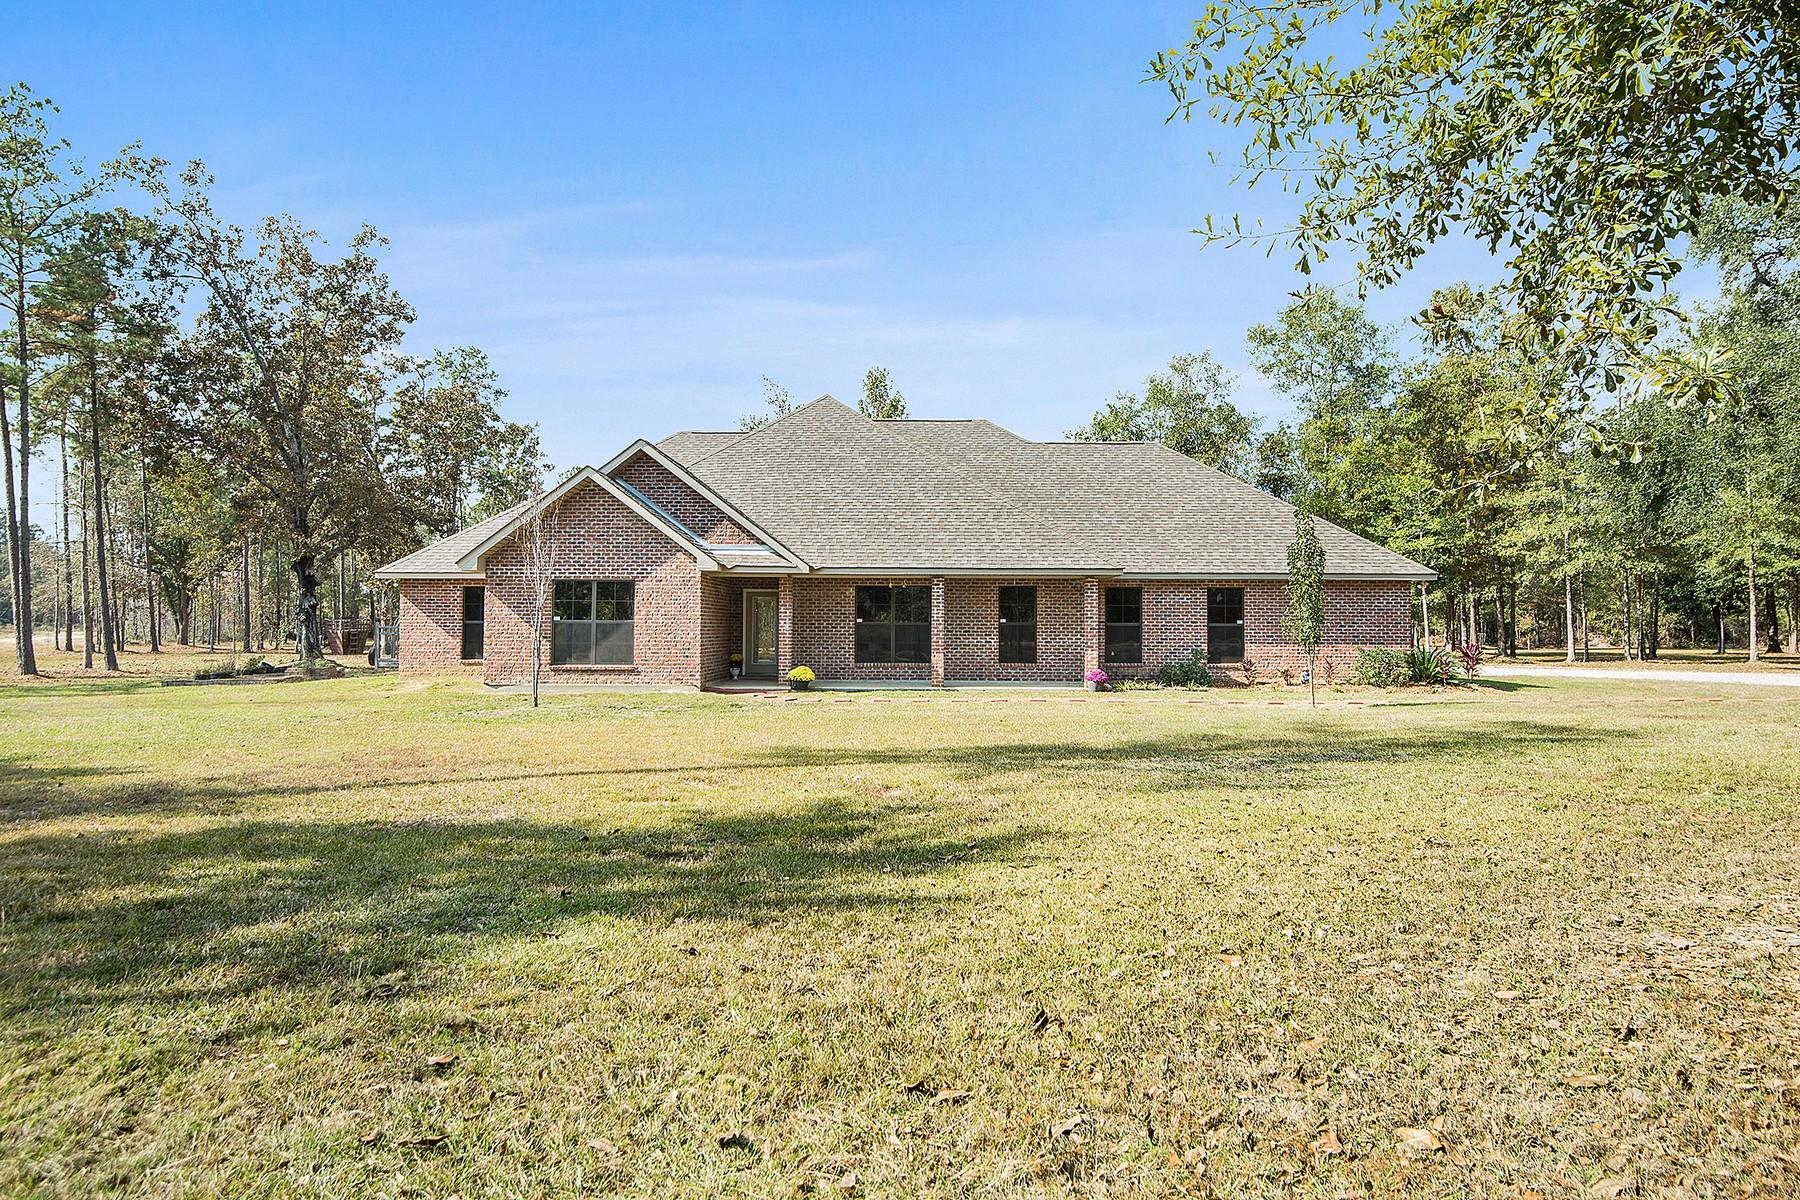 Moradia para Venda às 31349 Hartley Road 31349 Hartley Rd Bush, Louisiana, 70431 Estados Unidos